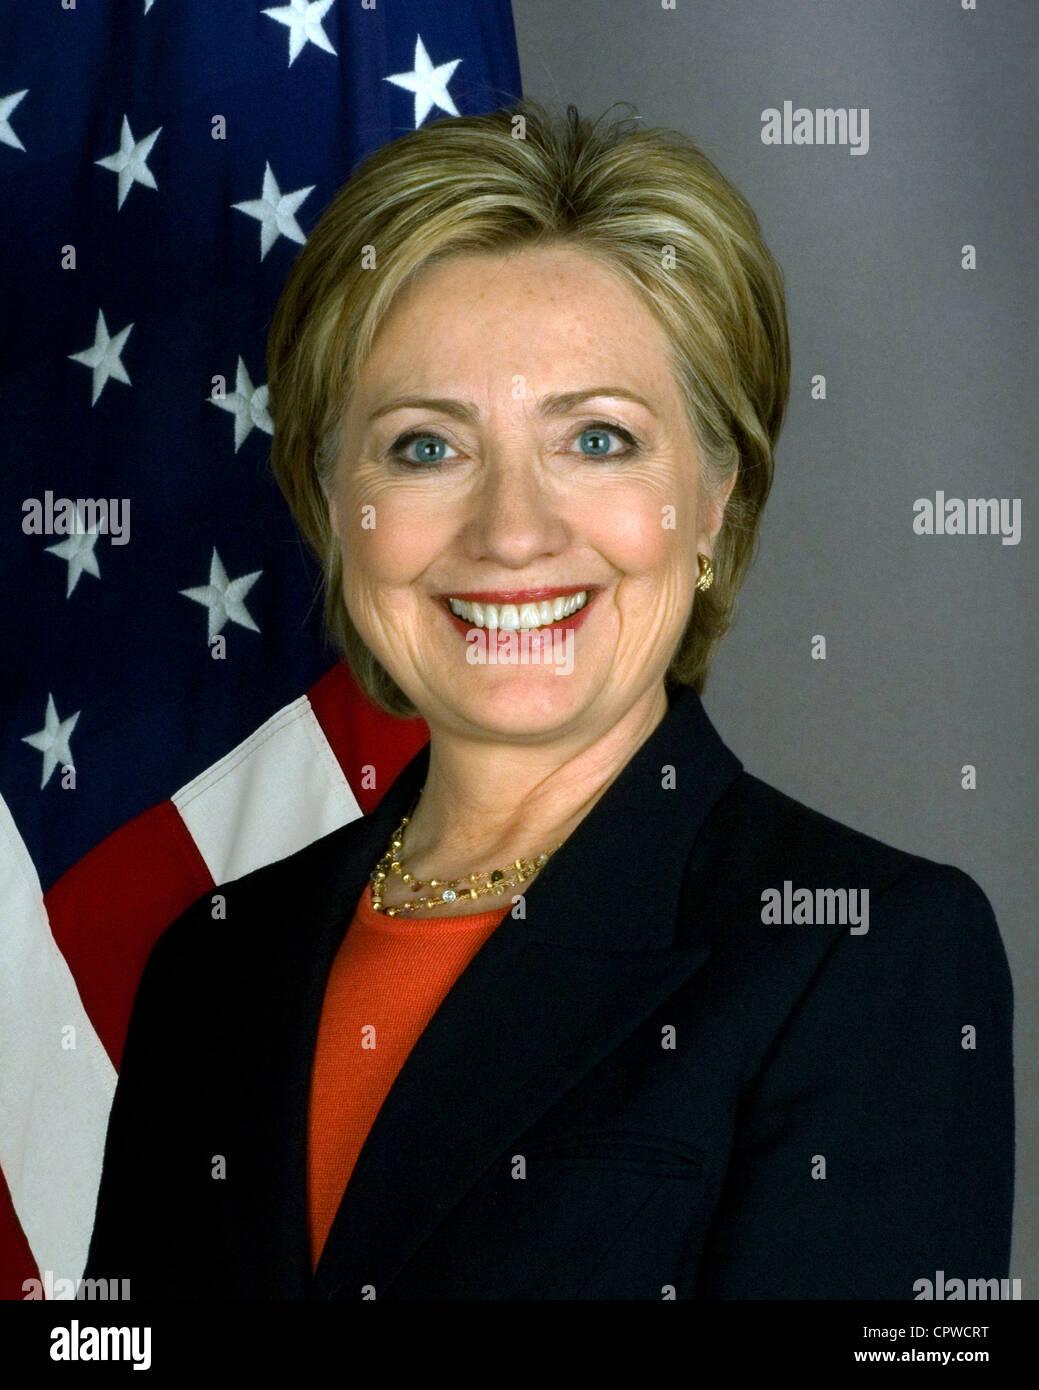 Hillary Clinton Stockbild